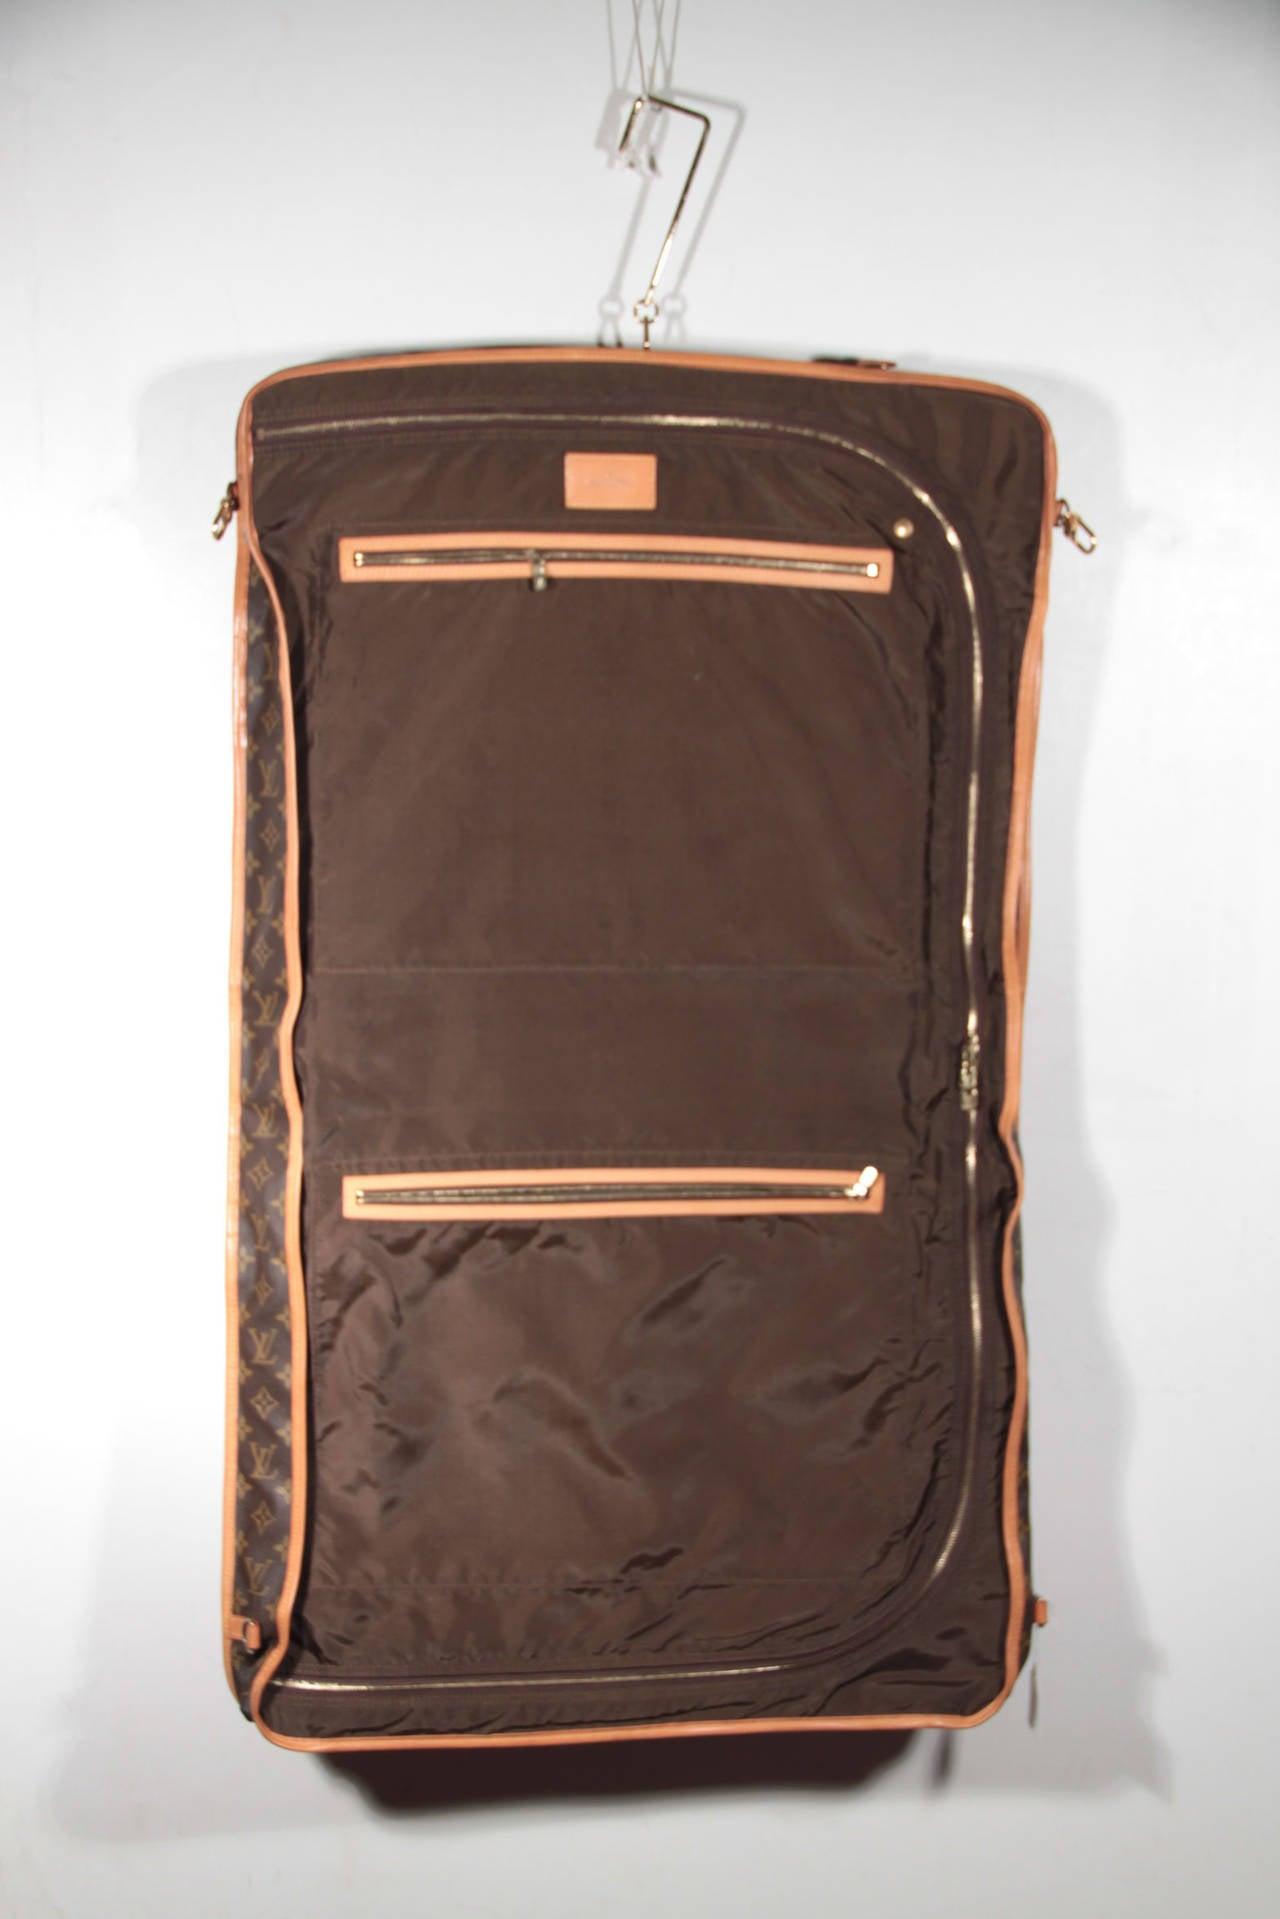 louis vuitton monogram canvas garment carrier bag travel suit cover 2 hangers for sale at 1stdibs